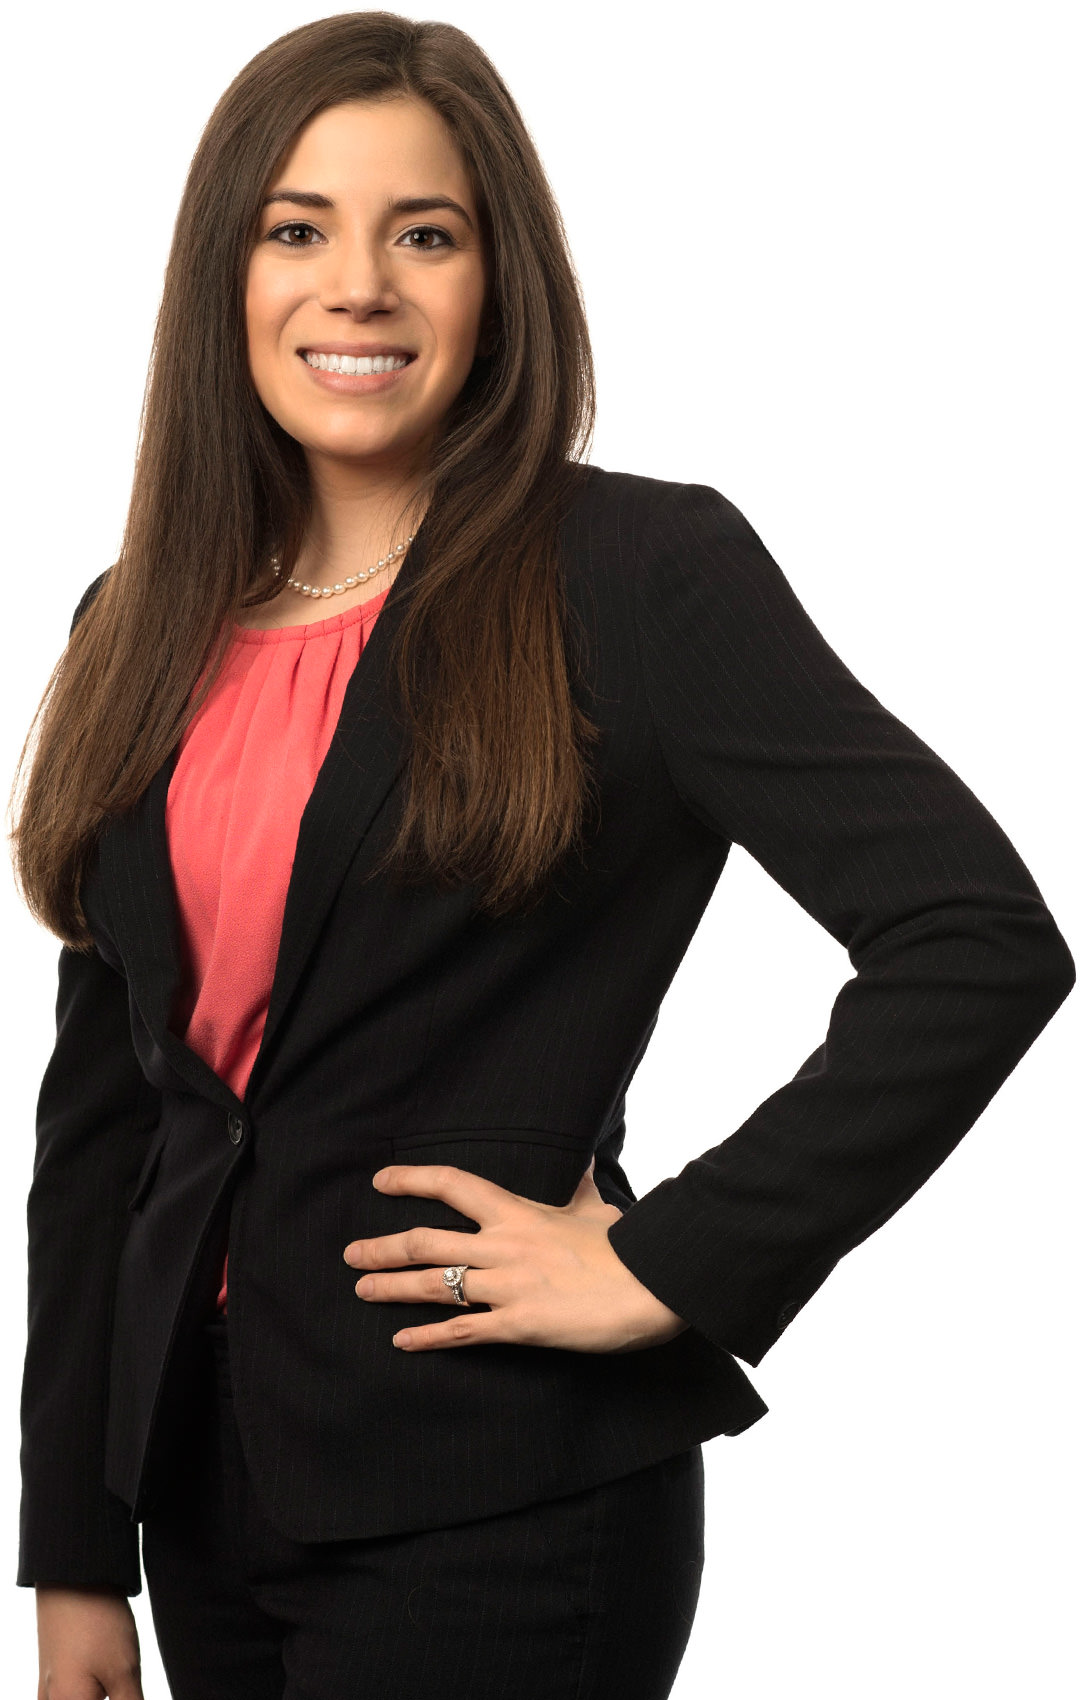 Nicole Cuadrado